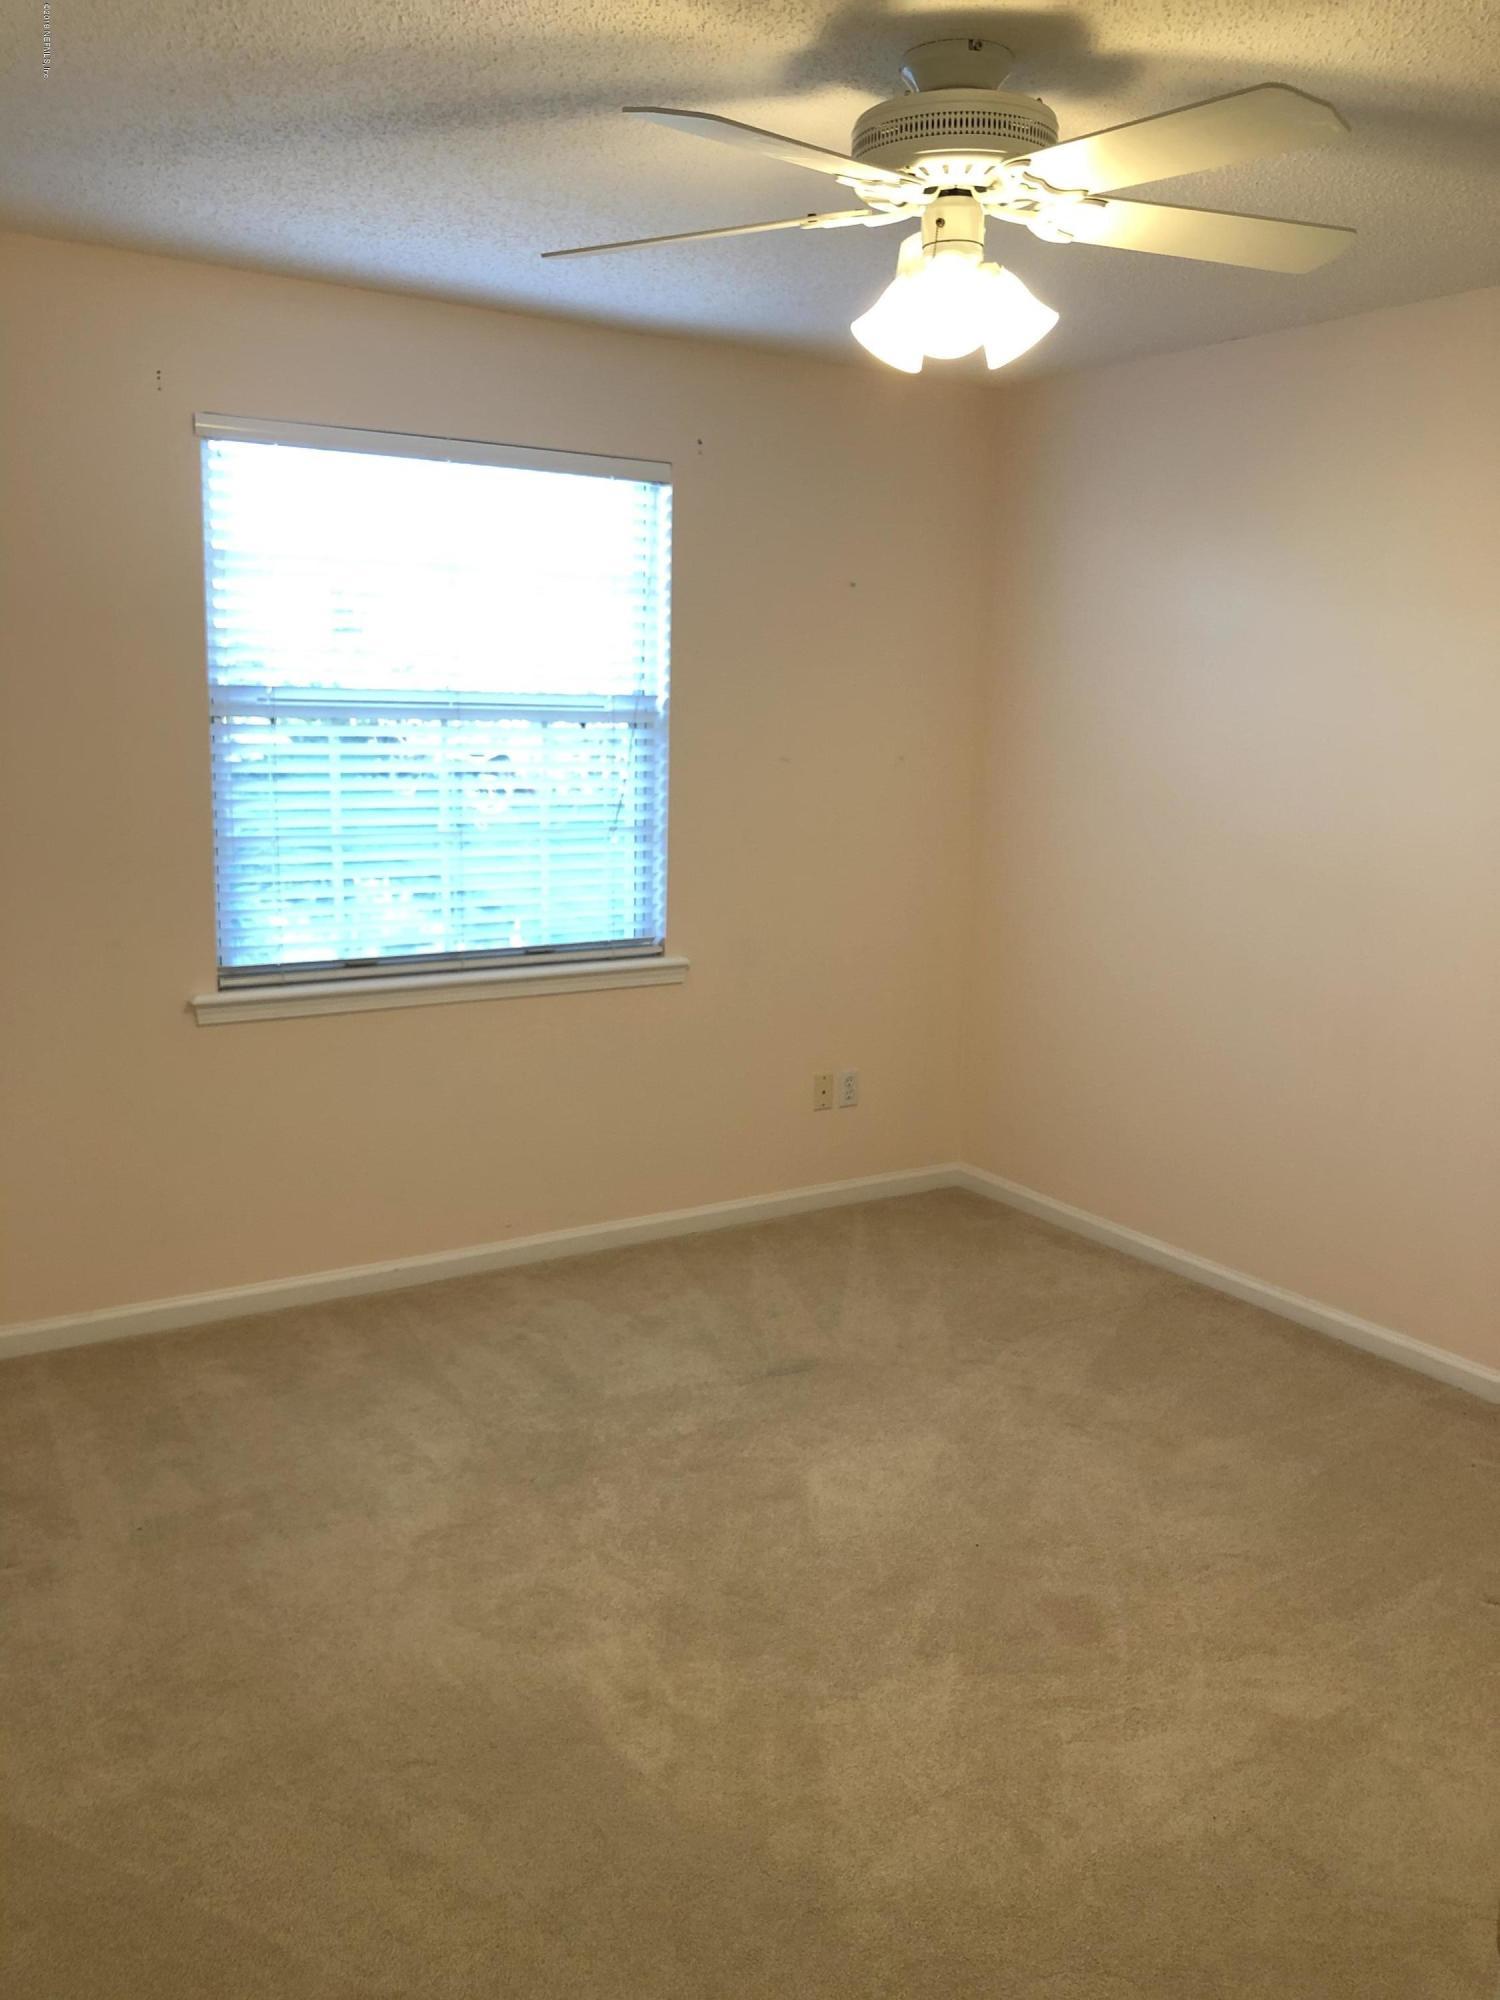 814 TOURNAMENT, PONTE VEDRA BEACH, FLORIDA 32082, 3 Bedrooms Bedrooms, ,2 BathroomsBathrooms,Rental,For Rent,TOURNAMENT,1025023